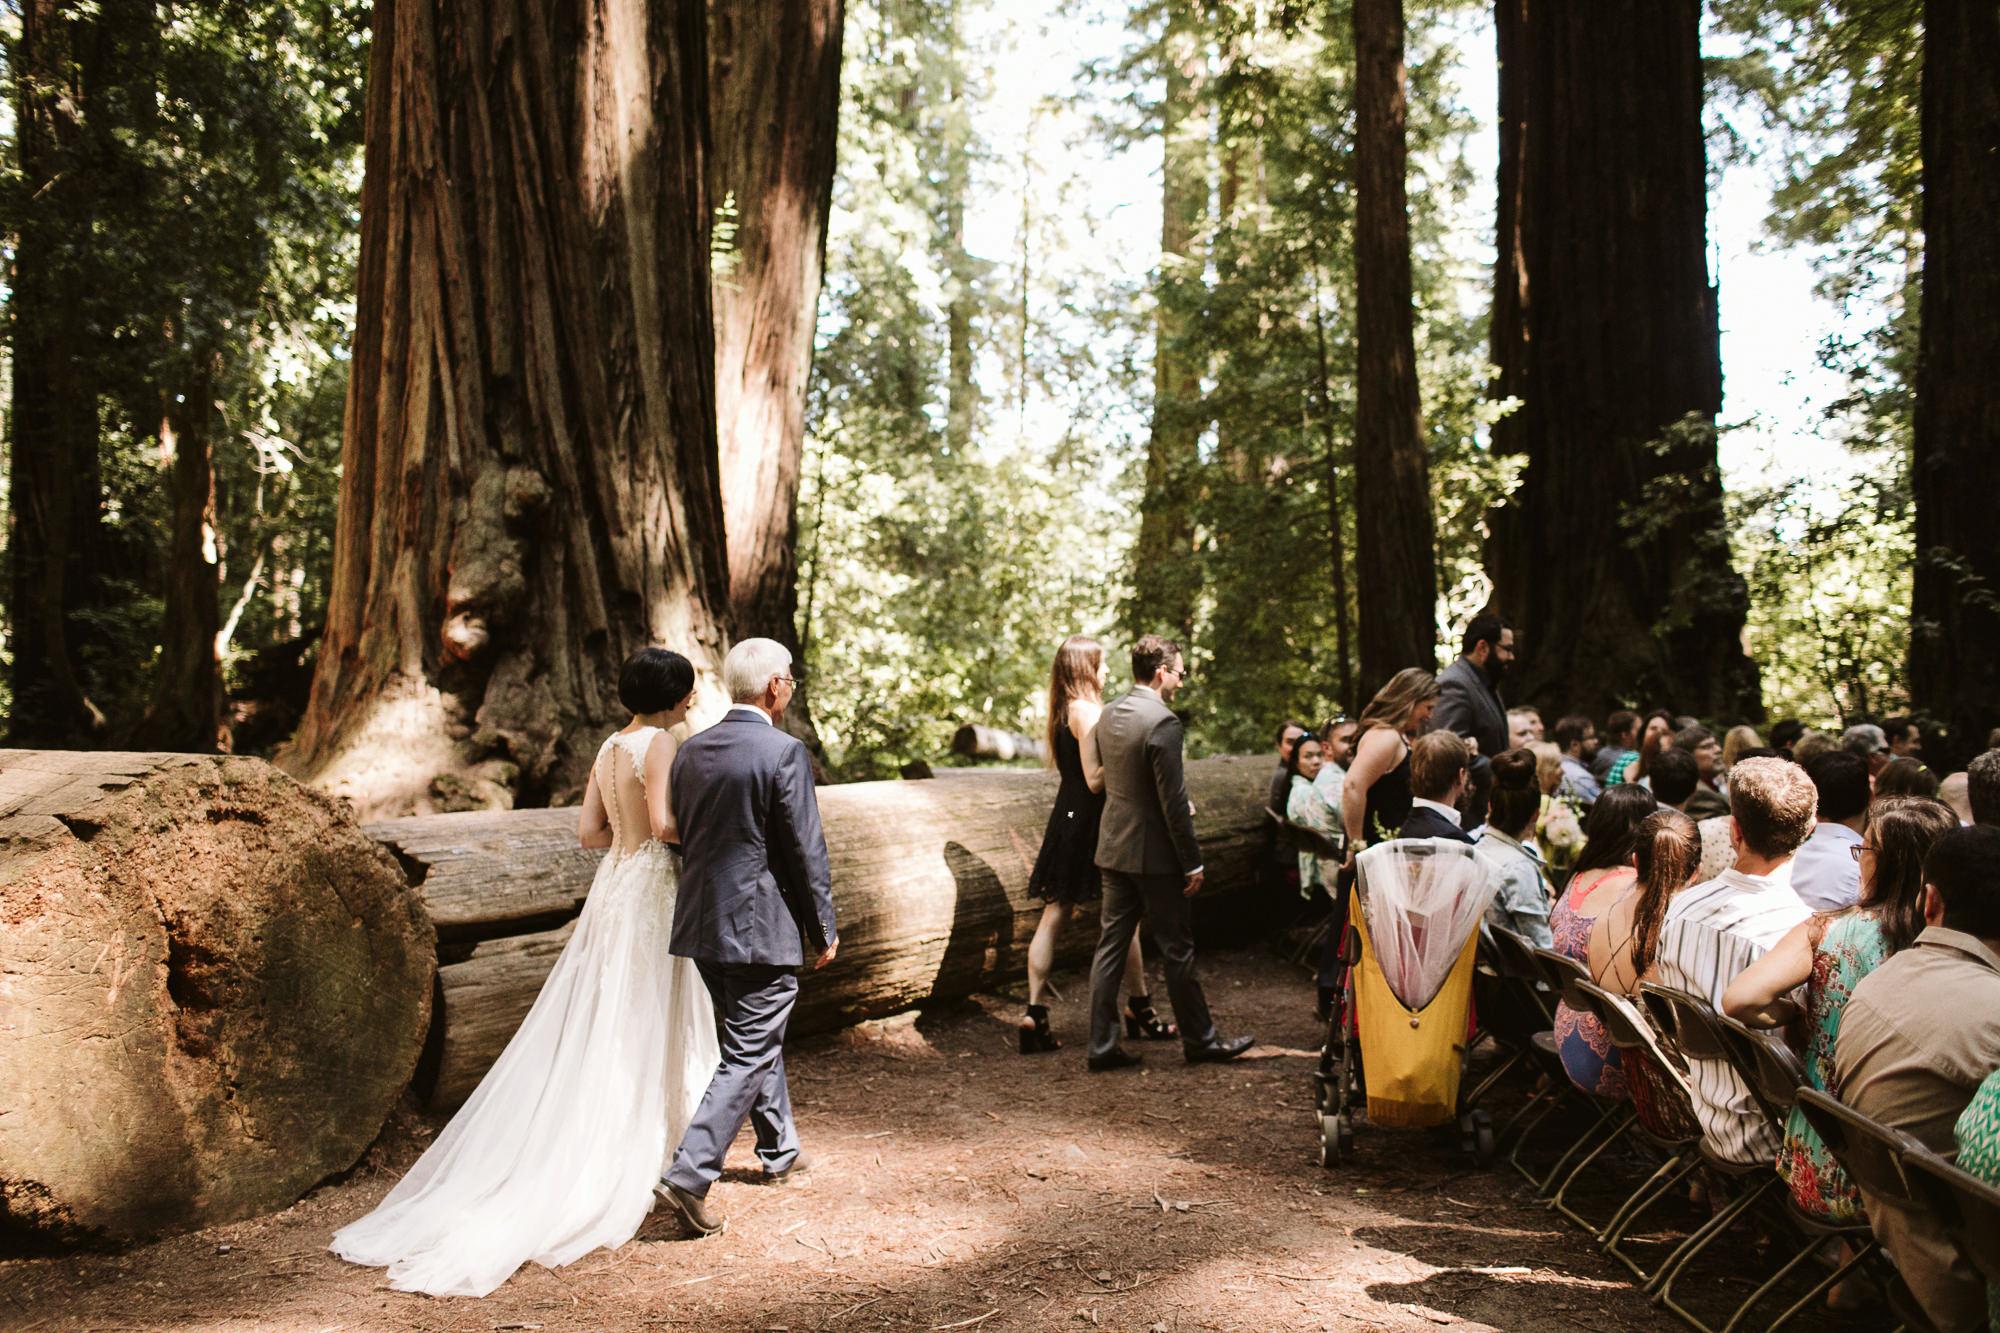 California-wedding-photographer-alfonso-flores-pamplin-groove-171.jpg